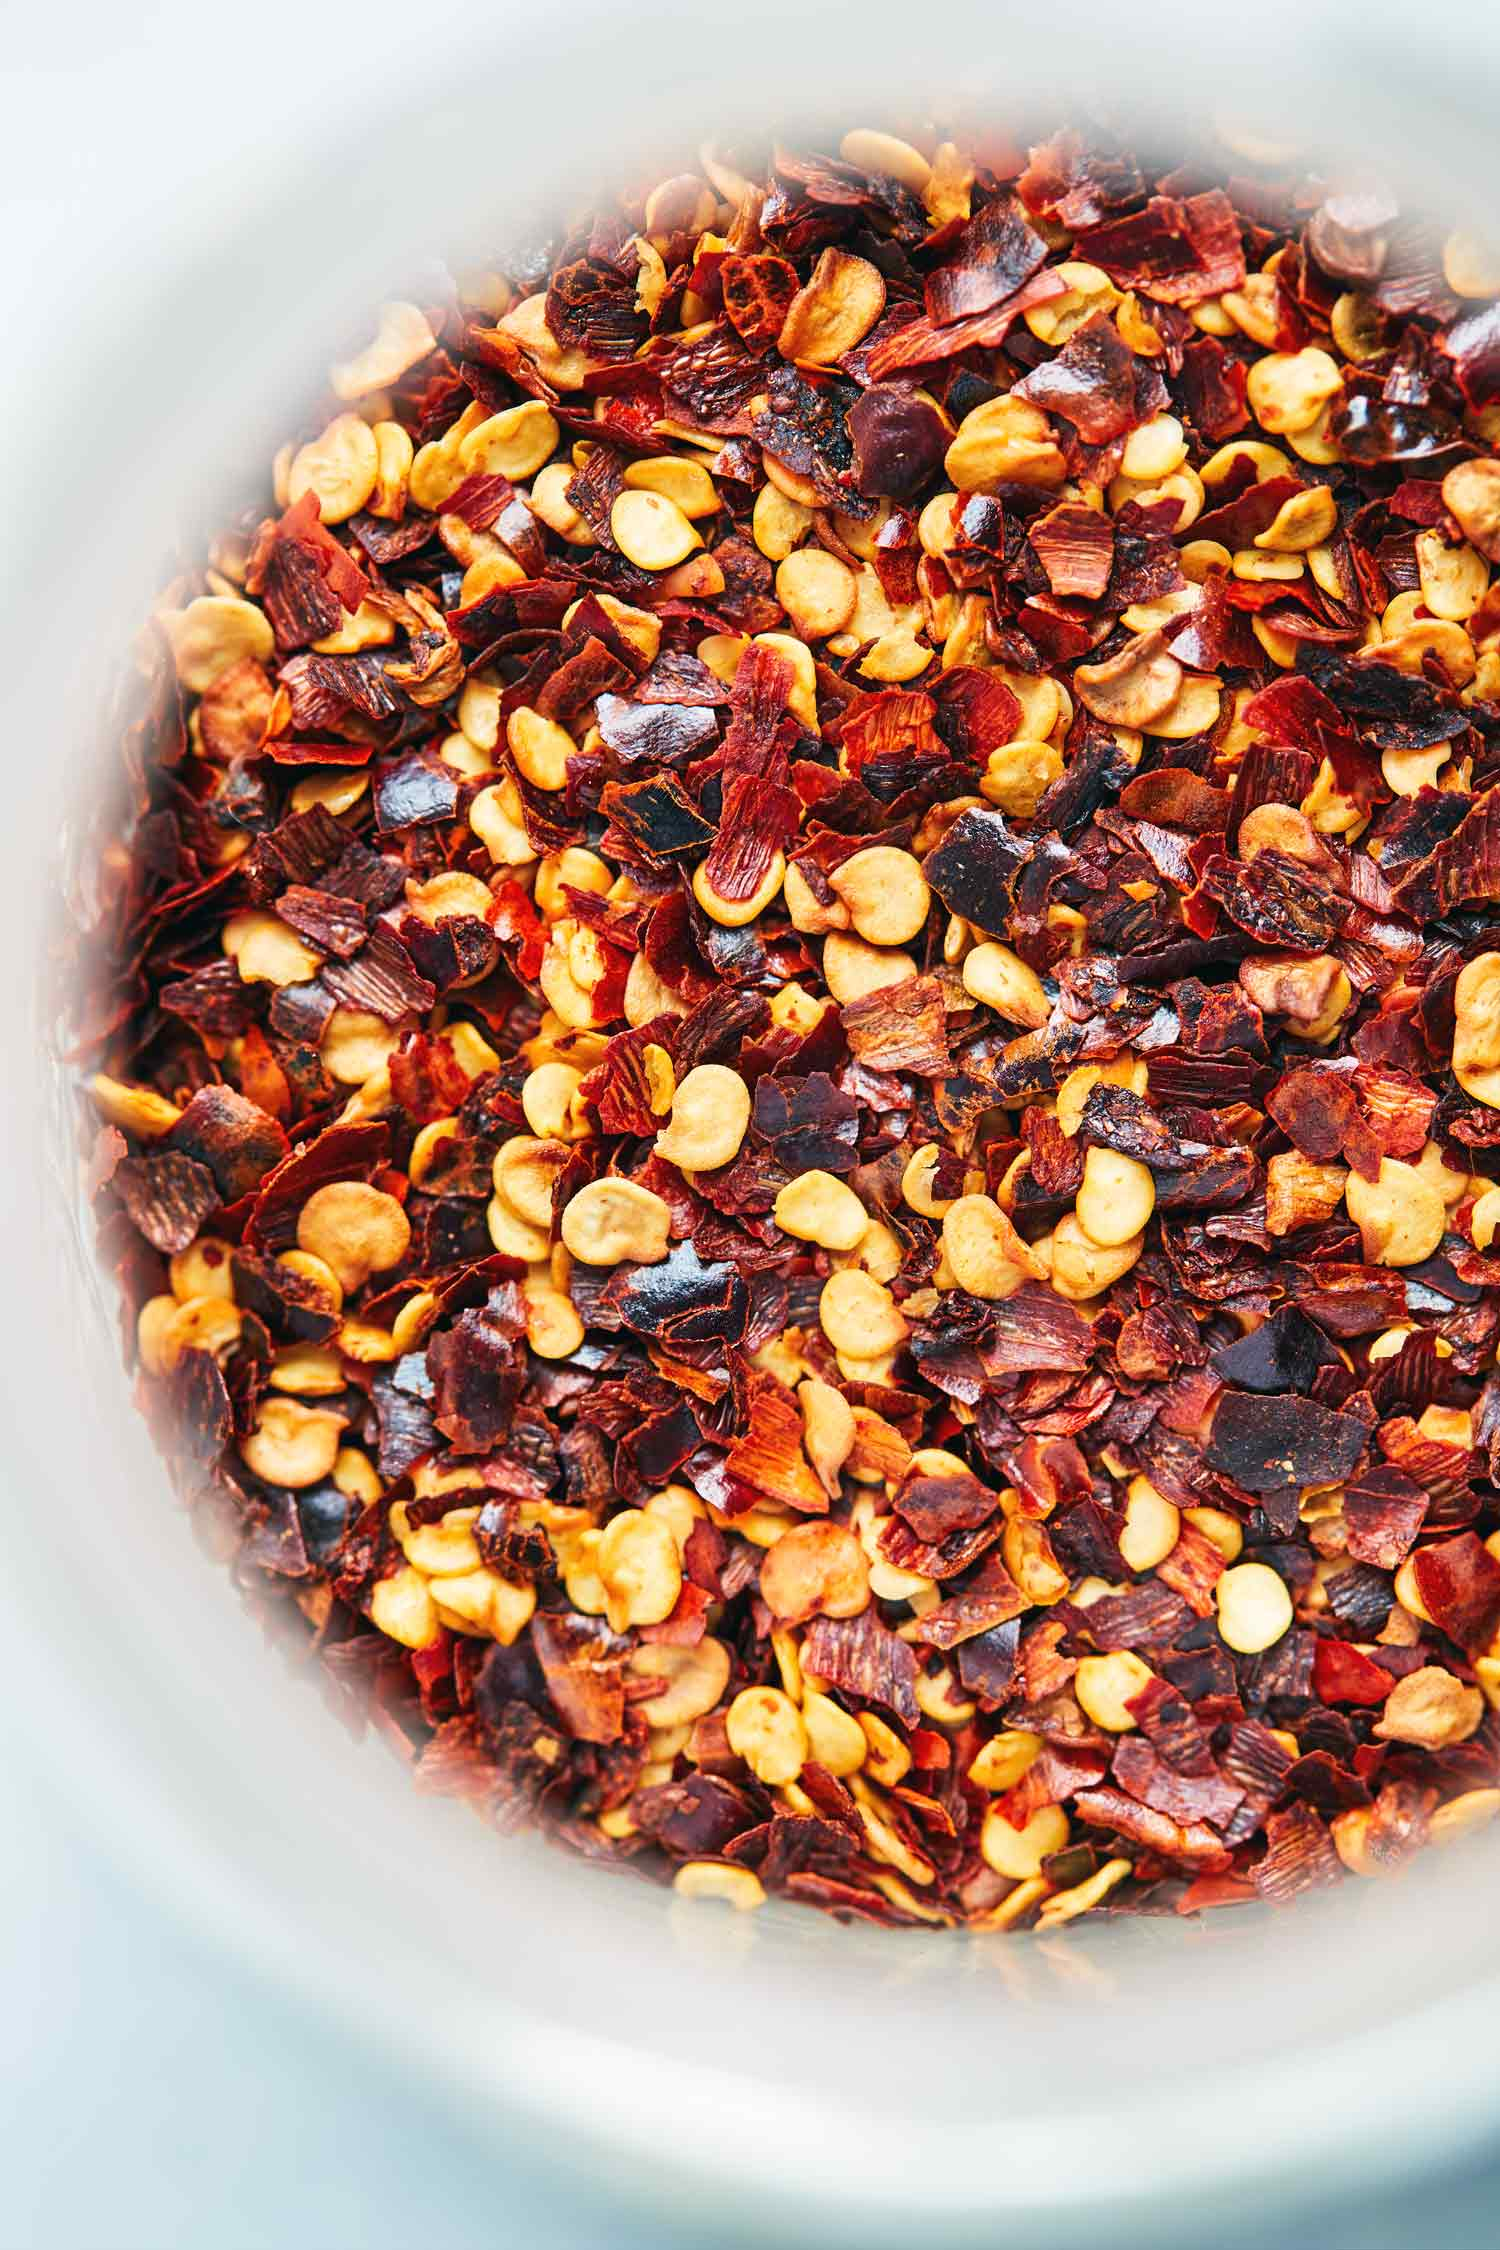 Homemade Chili Garlic Oil | Evergreen Kitchen | Vegan, Gluten Free